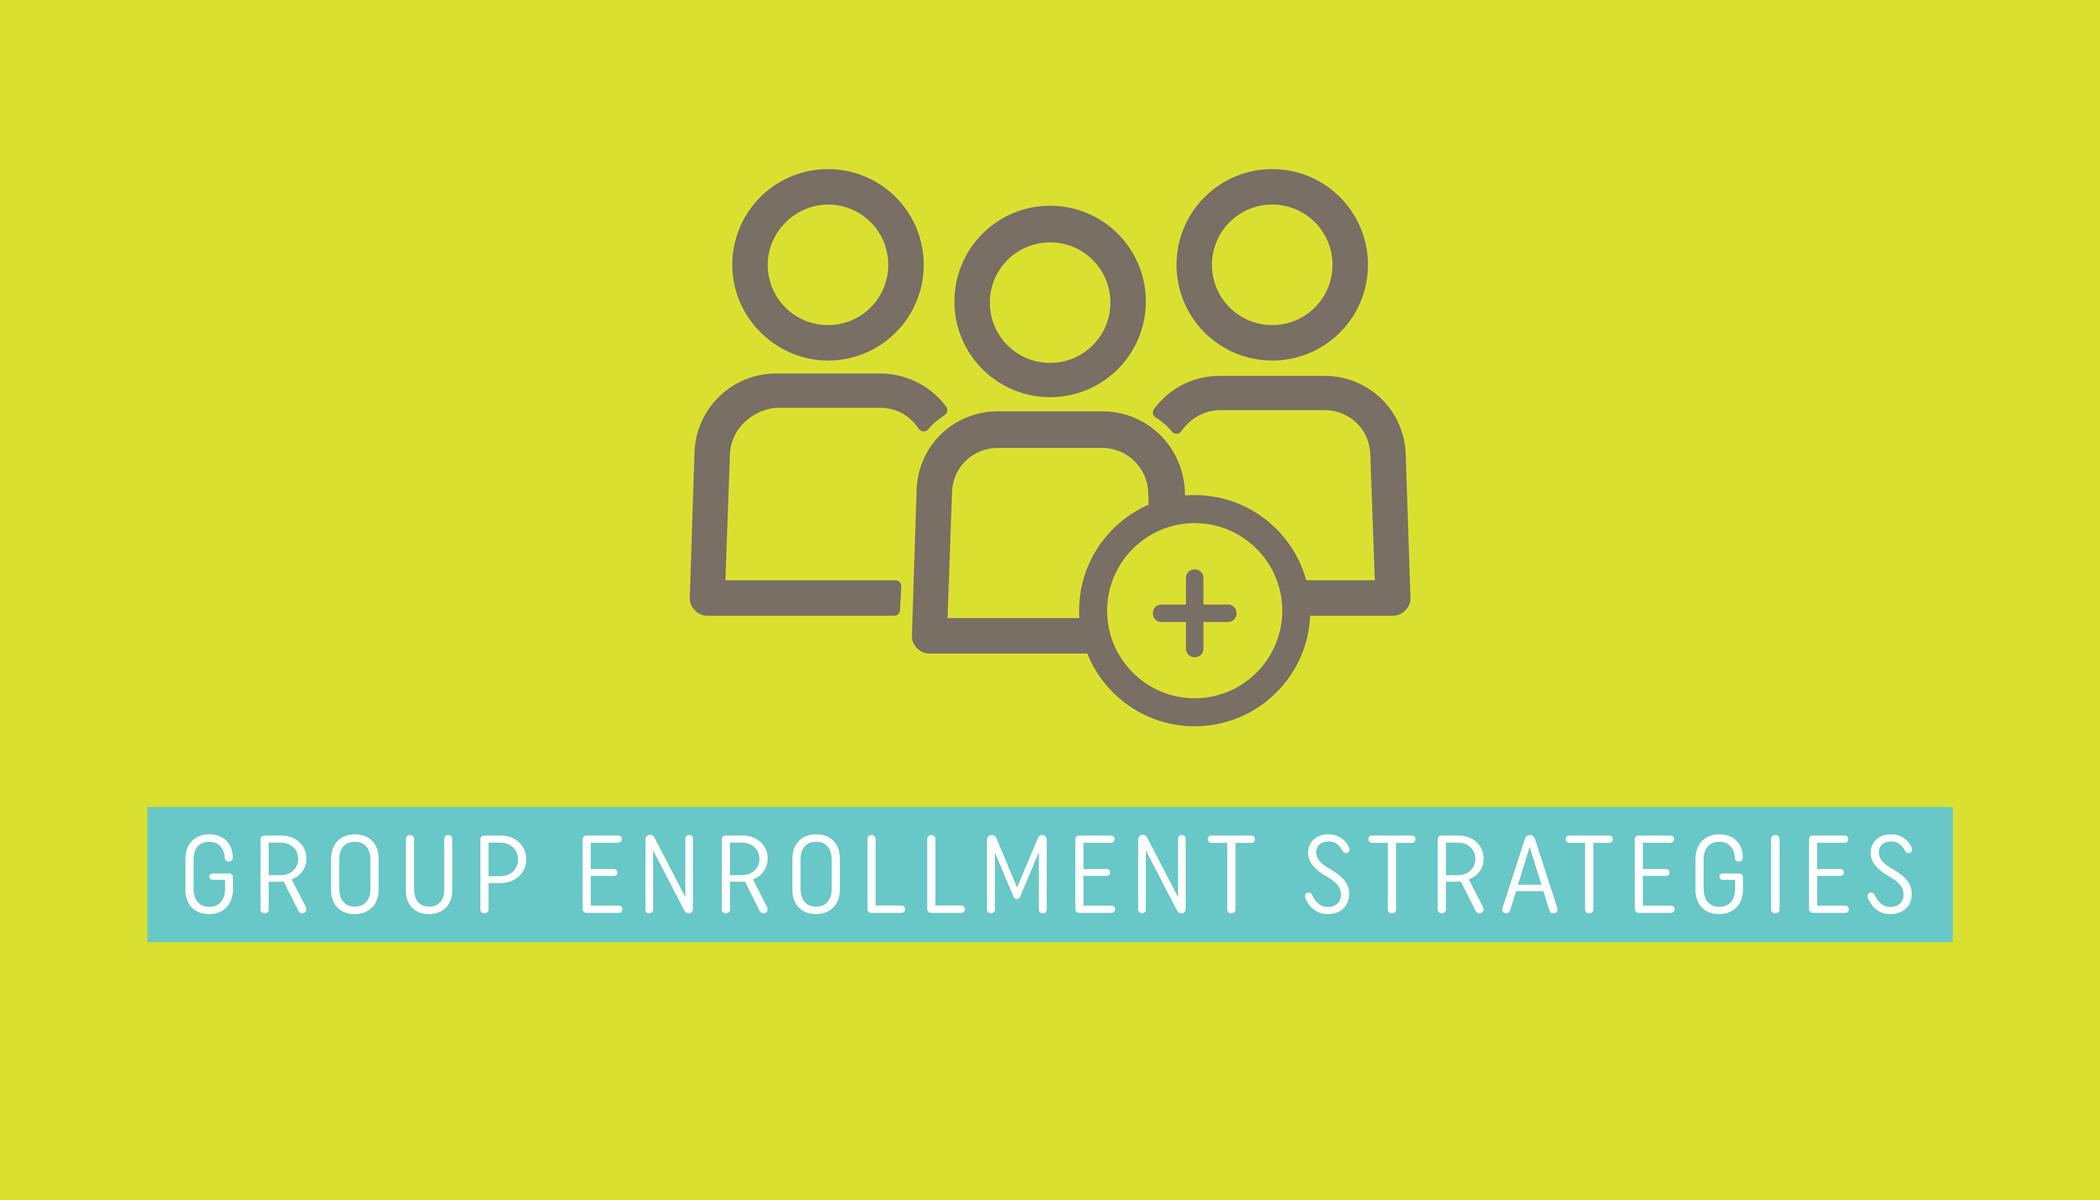 Group Enrollment Strategies